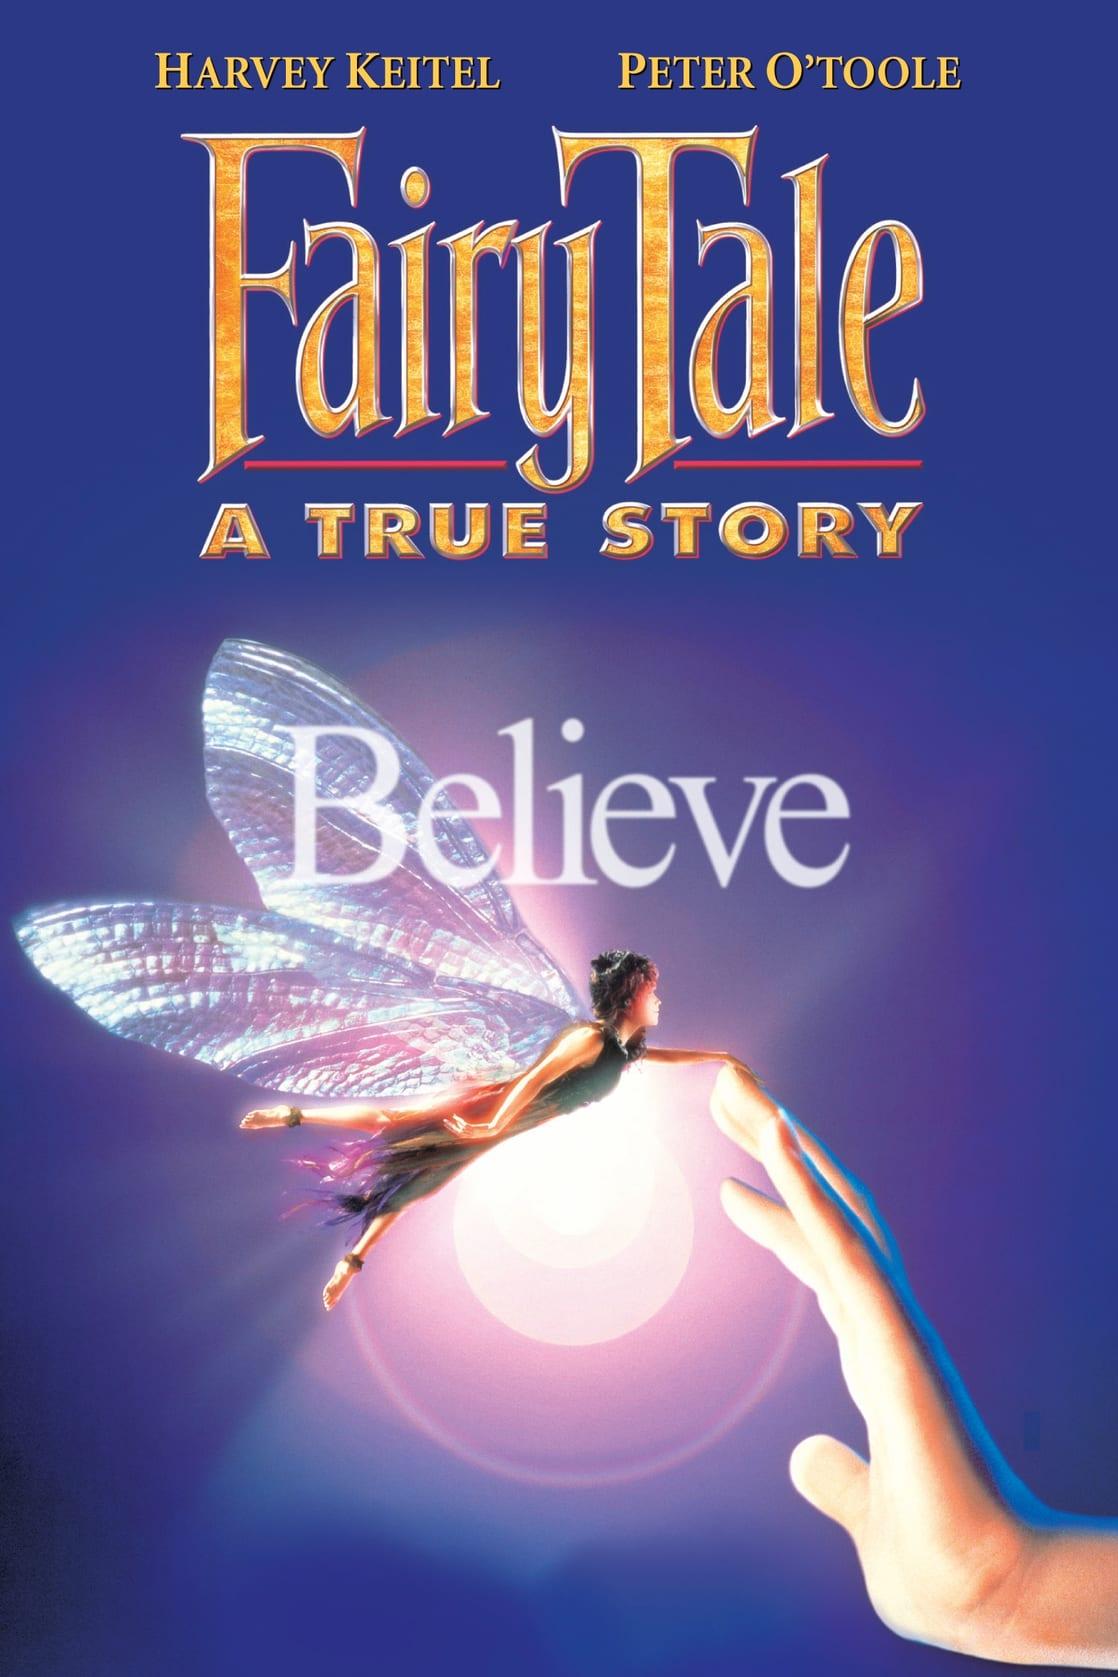 True Story Magazine Subscription: Good Fantasy Movies (1995-00): The Sprite Stuff • Itcher